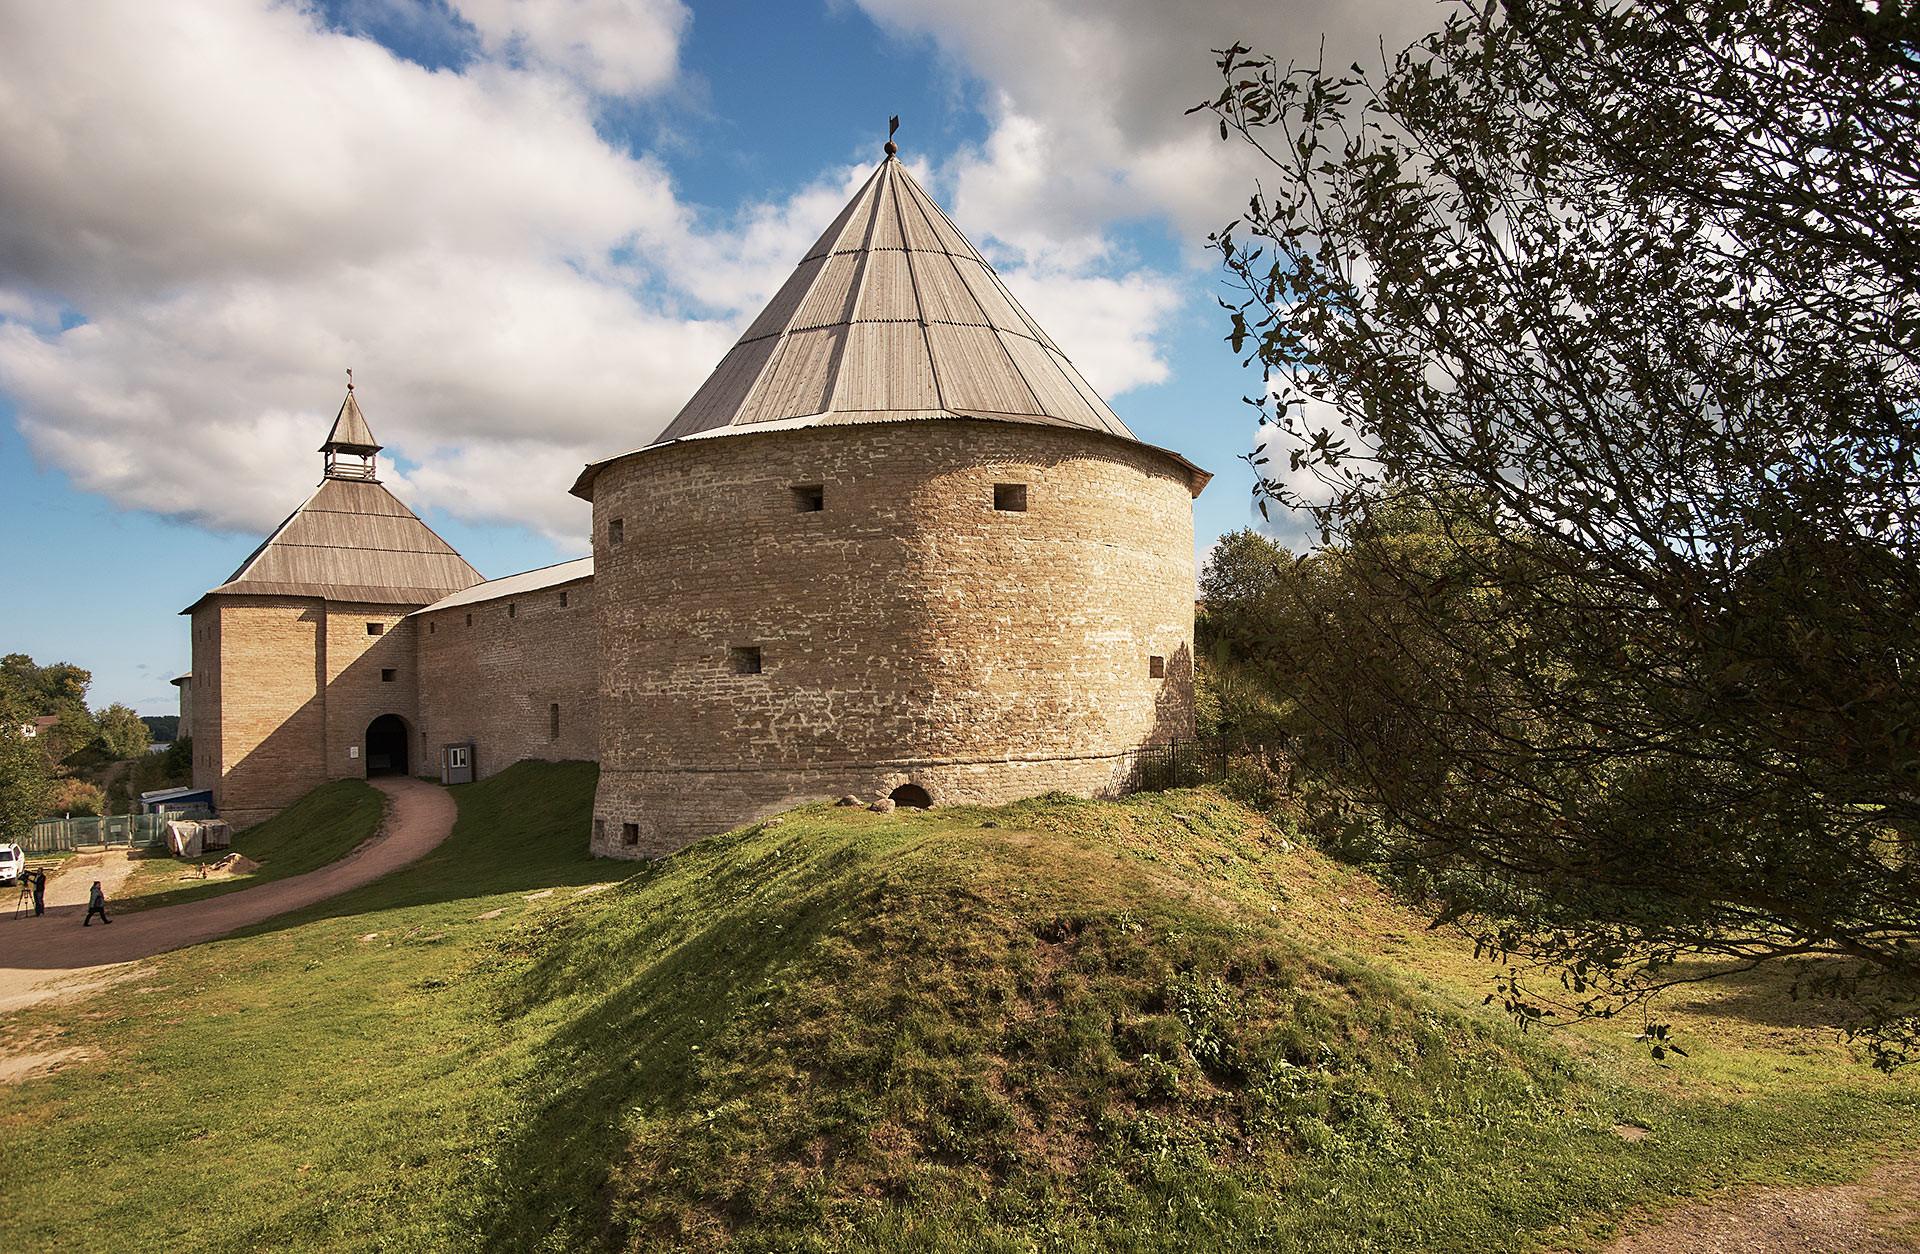 Кулата Климент в крепостта Ладога, село Старая Ладога, Ленинградска област